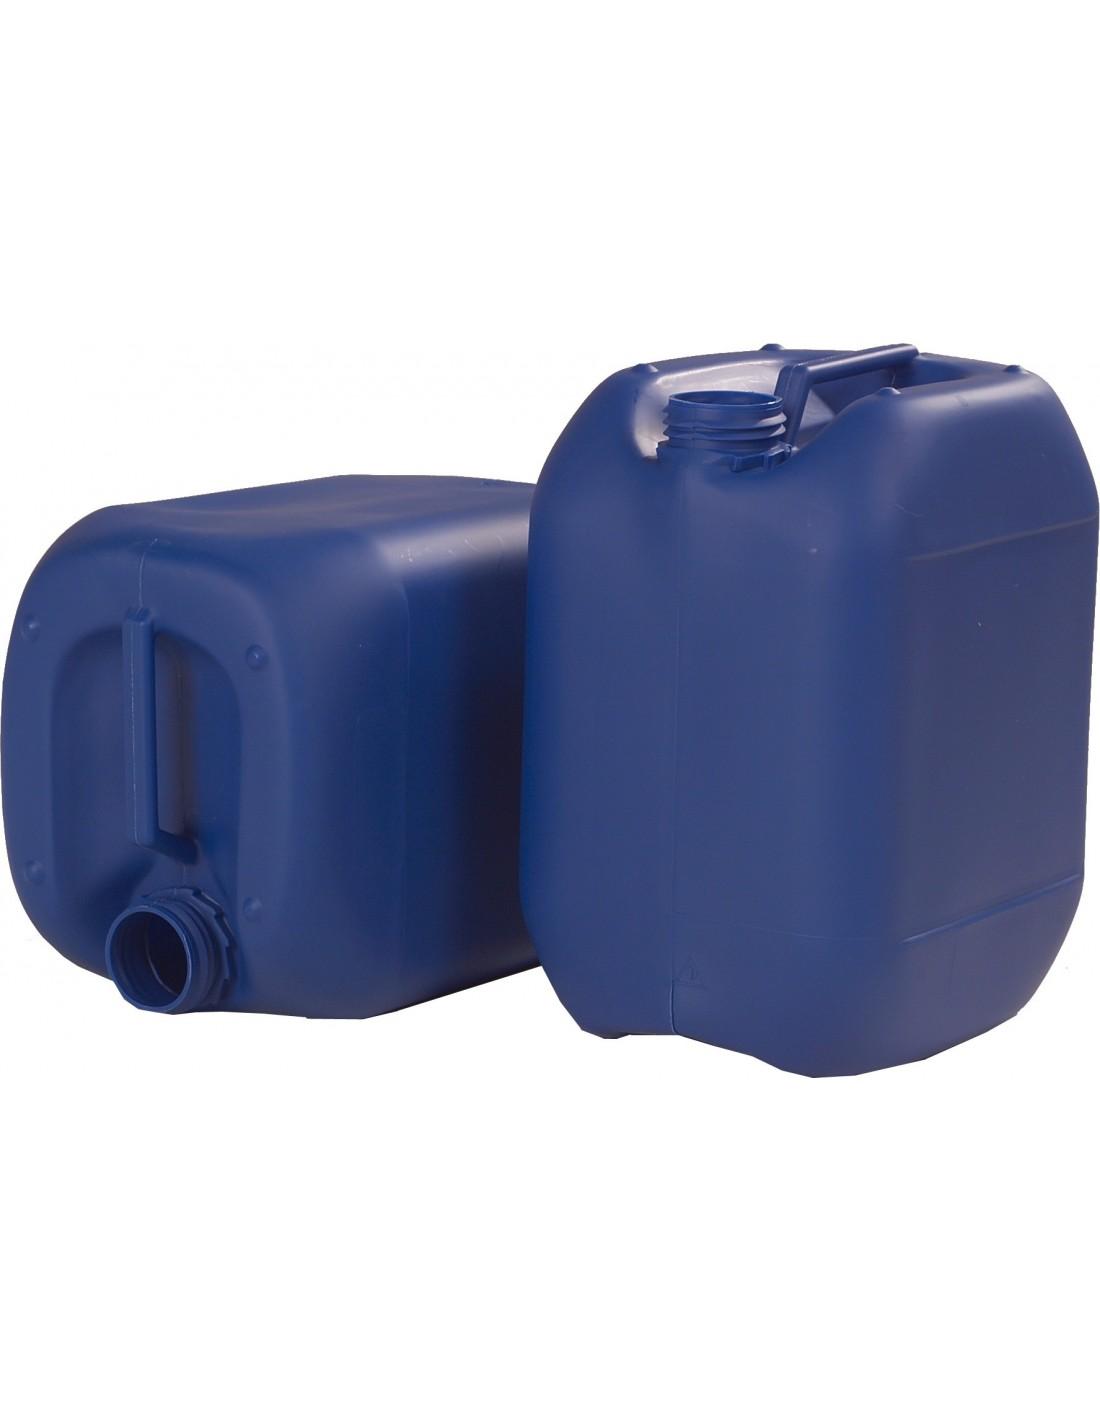 10 Liter Kanister UN-X, ohne Verschluss